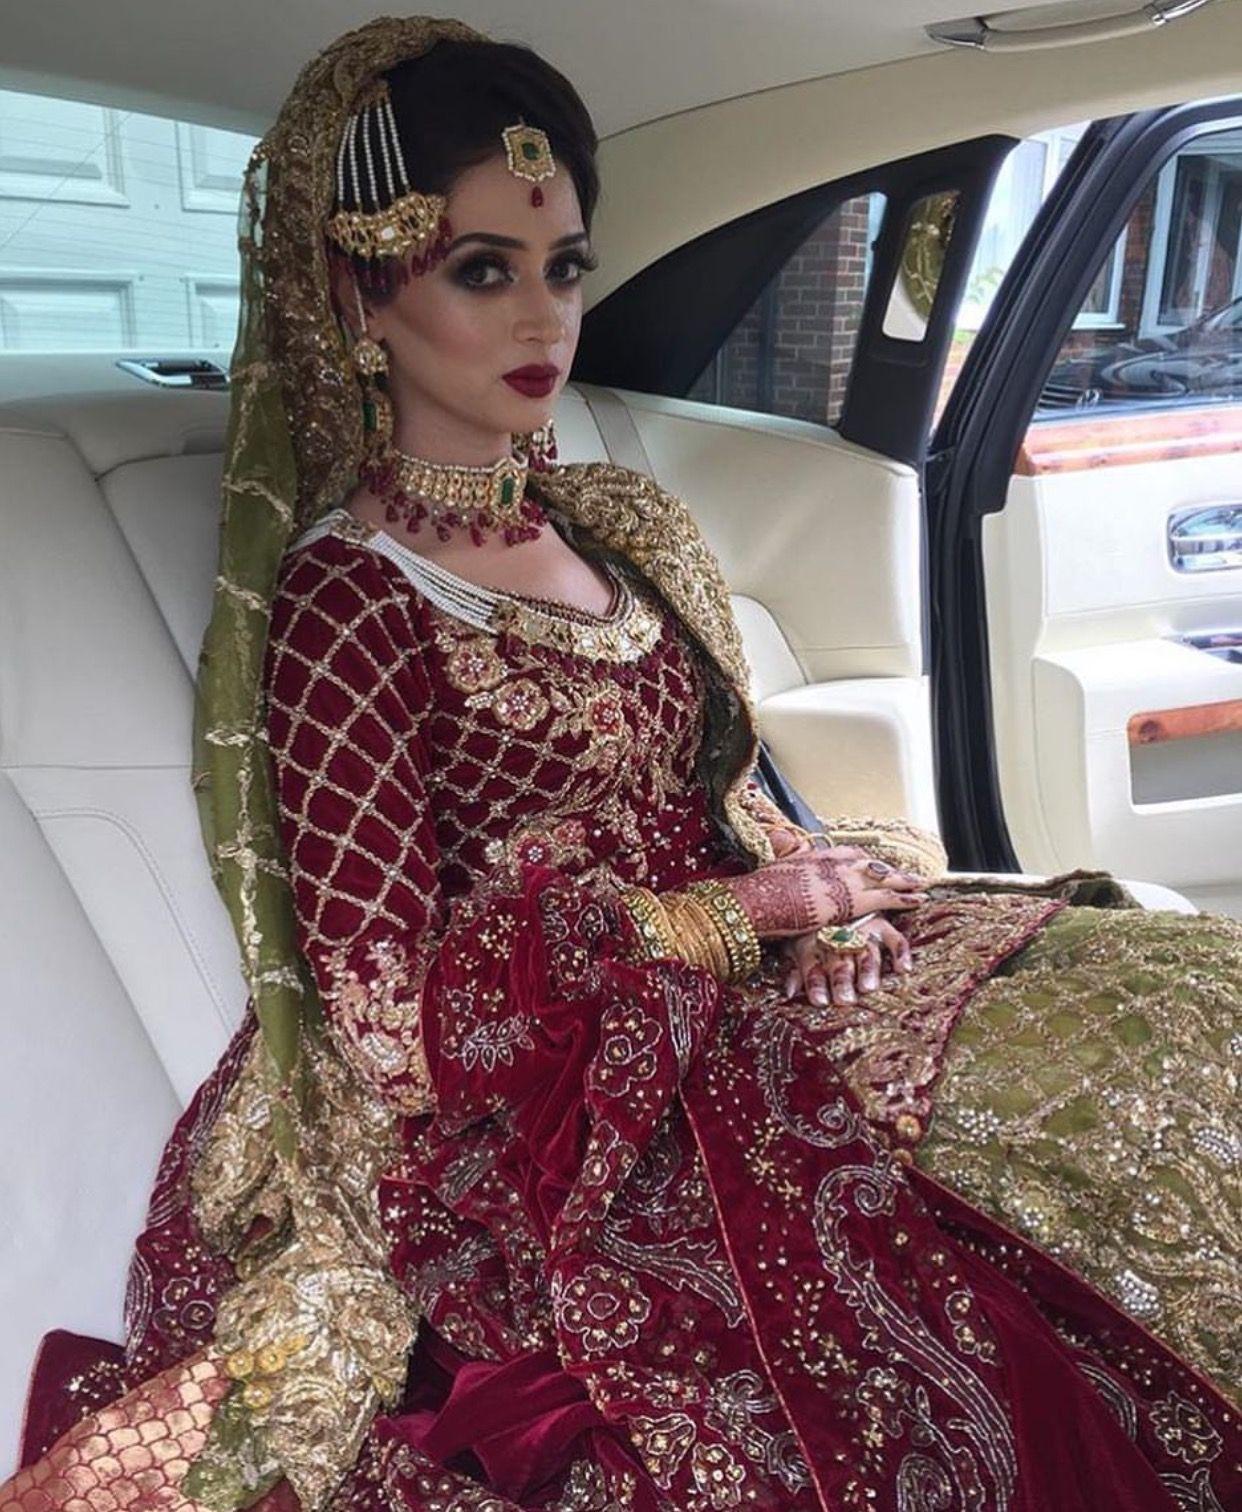 Pin von iqra ullah auf Wedding Diaries (Pakistani) | Pinterest